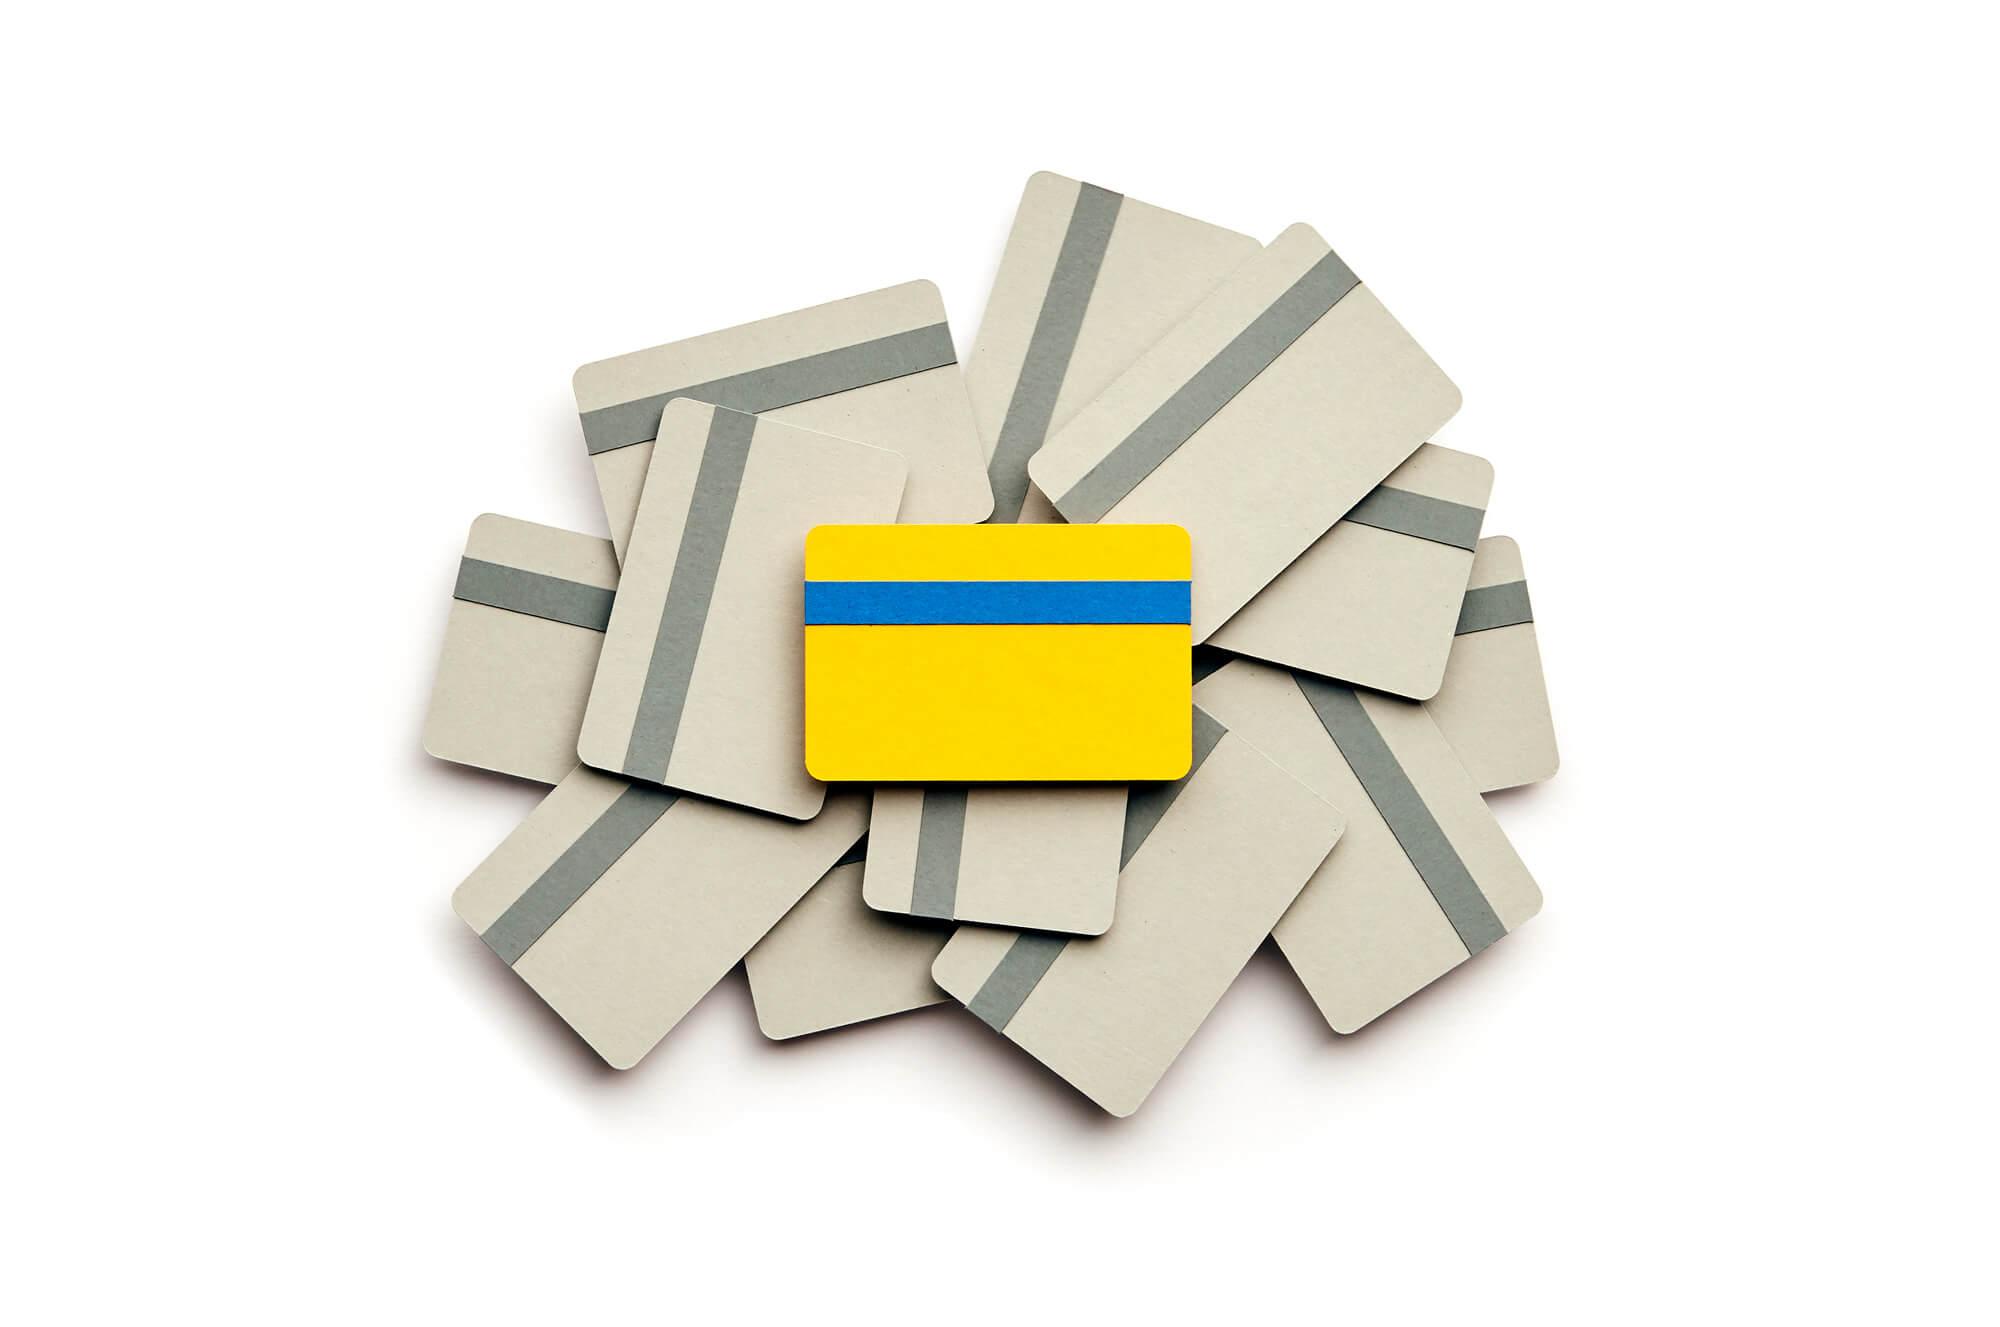 score_Synchronybank_paperart_katrinrodegast_cards